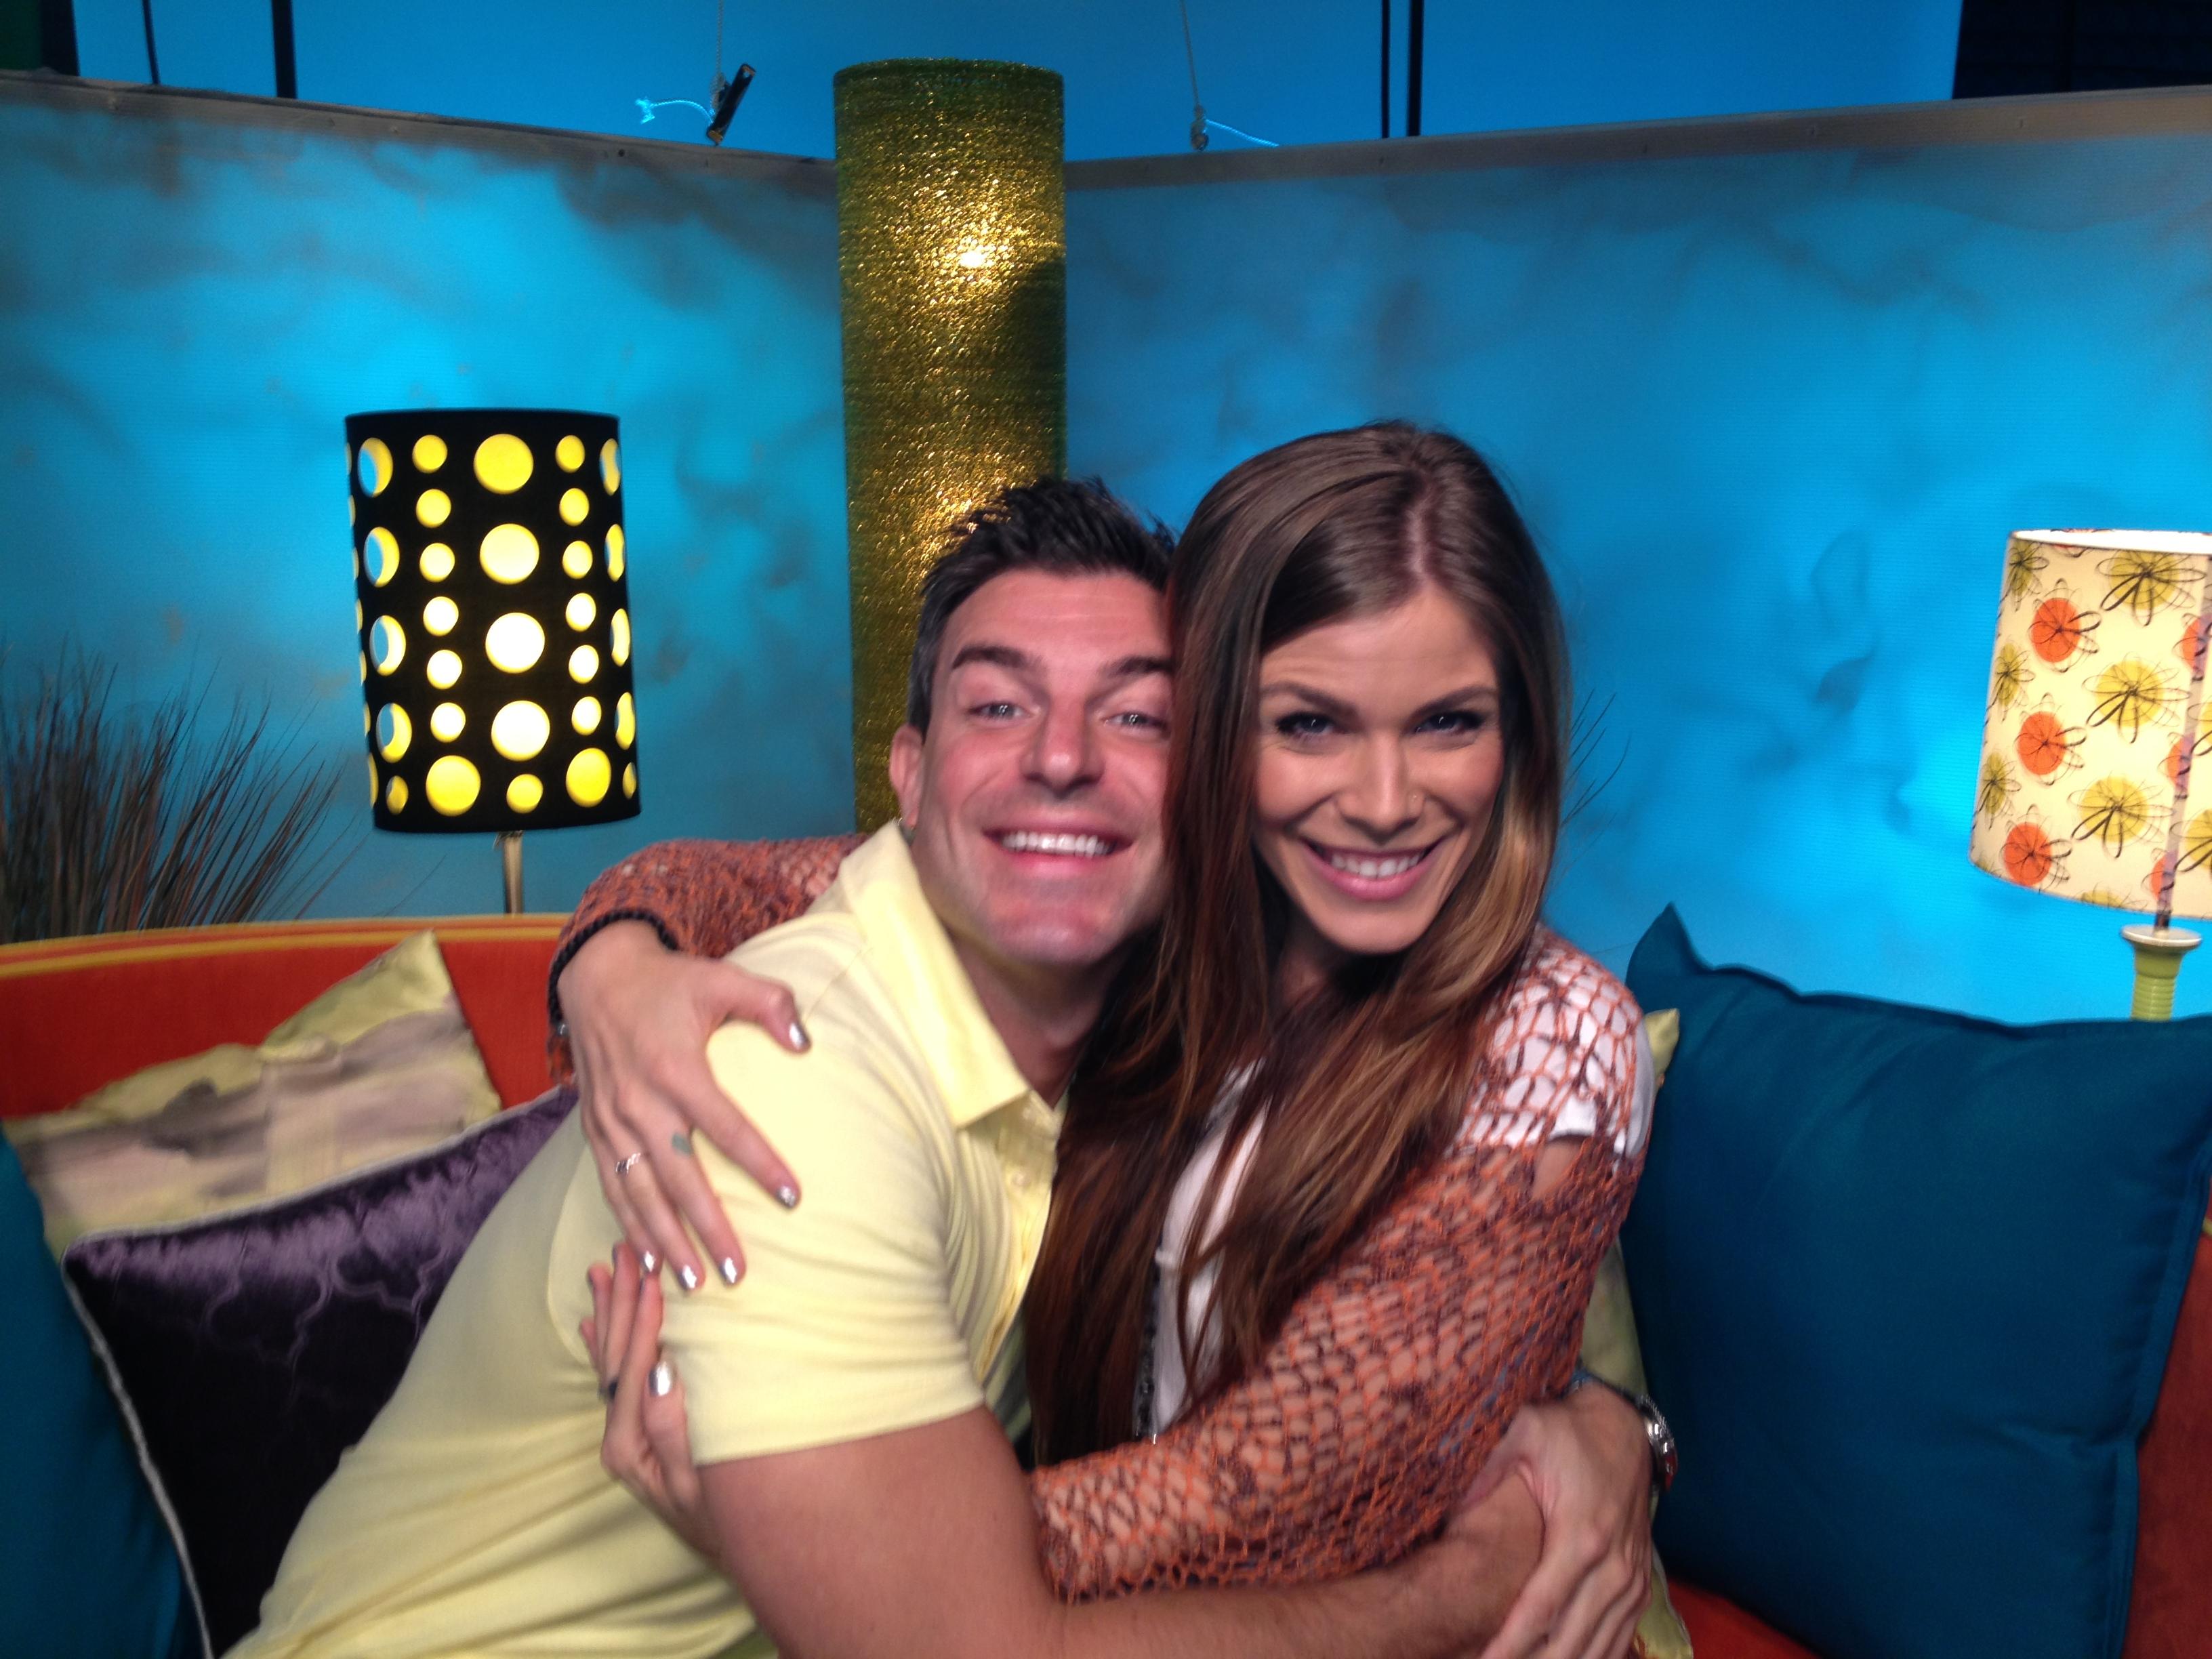 Jeff and Daniele